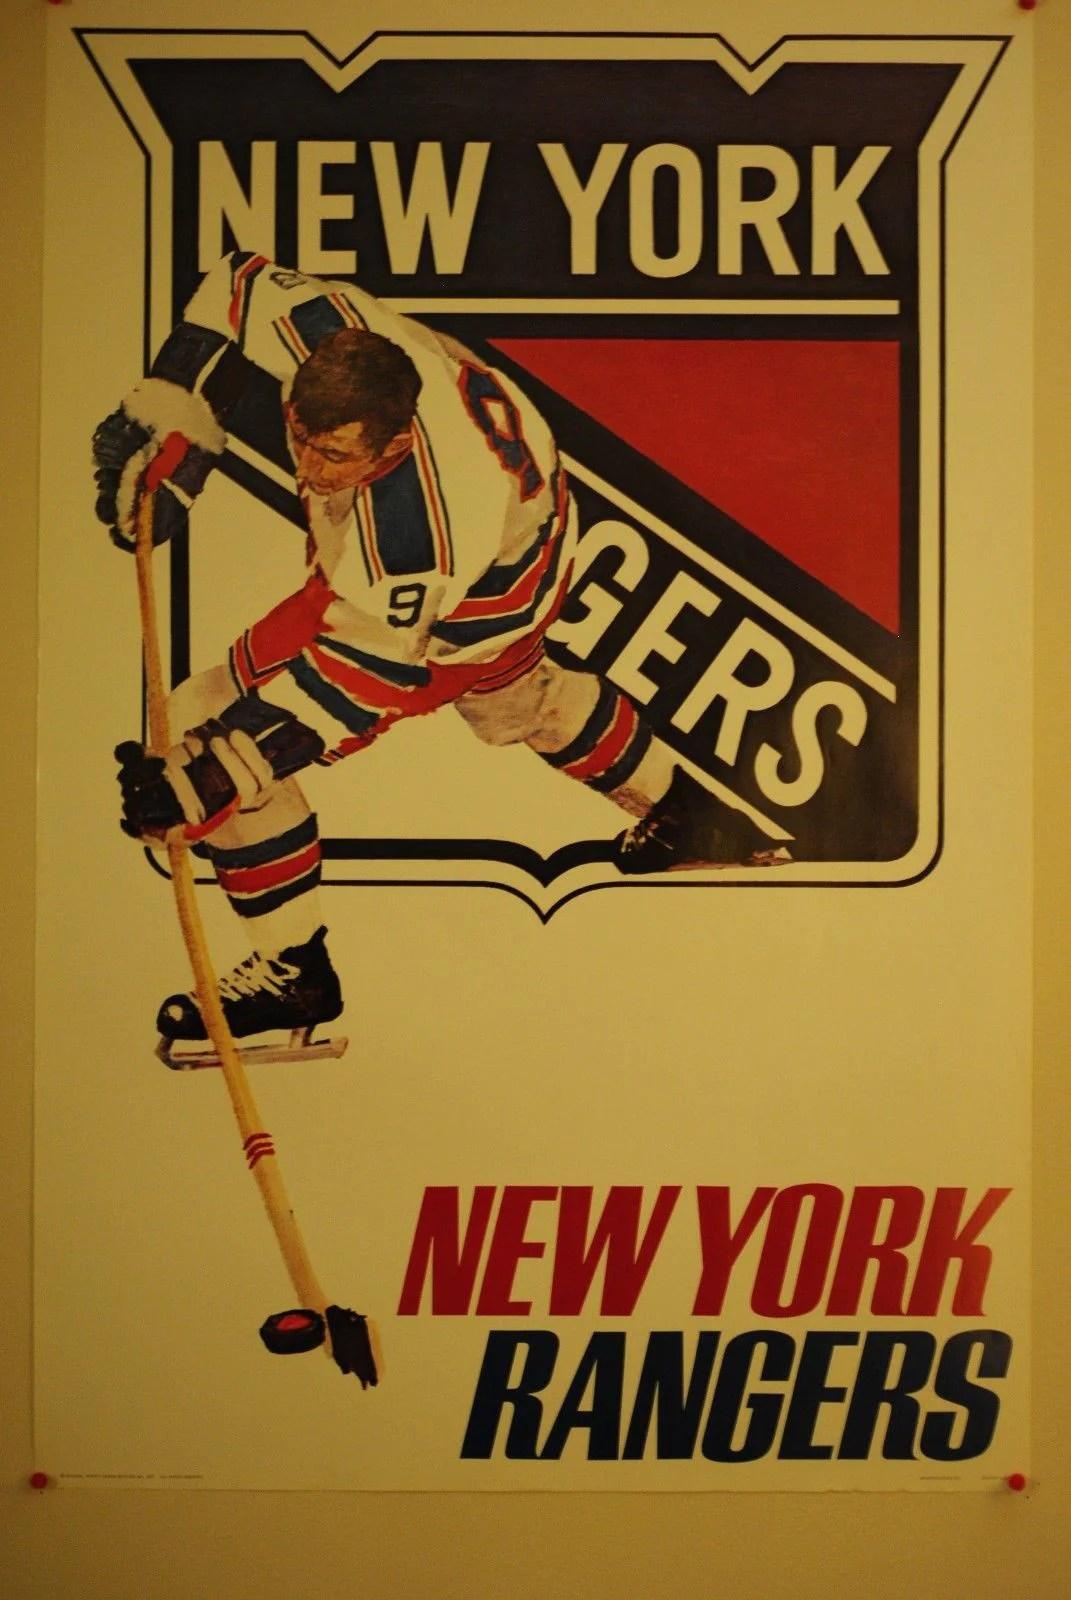 nhl posters new york rangers